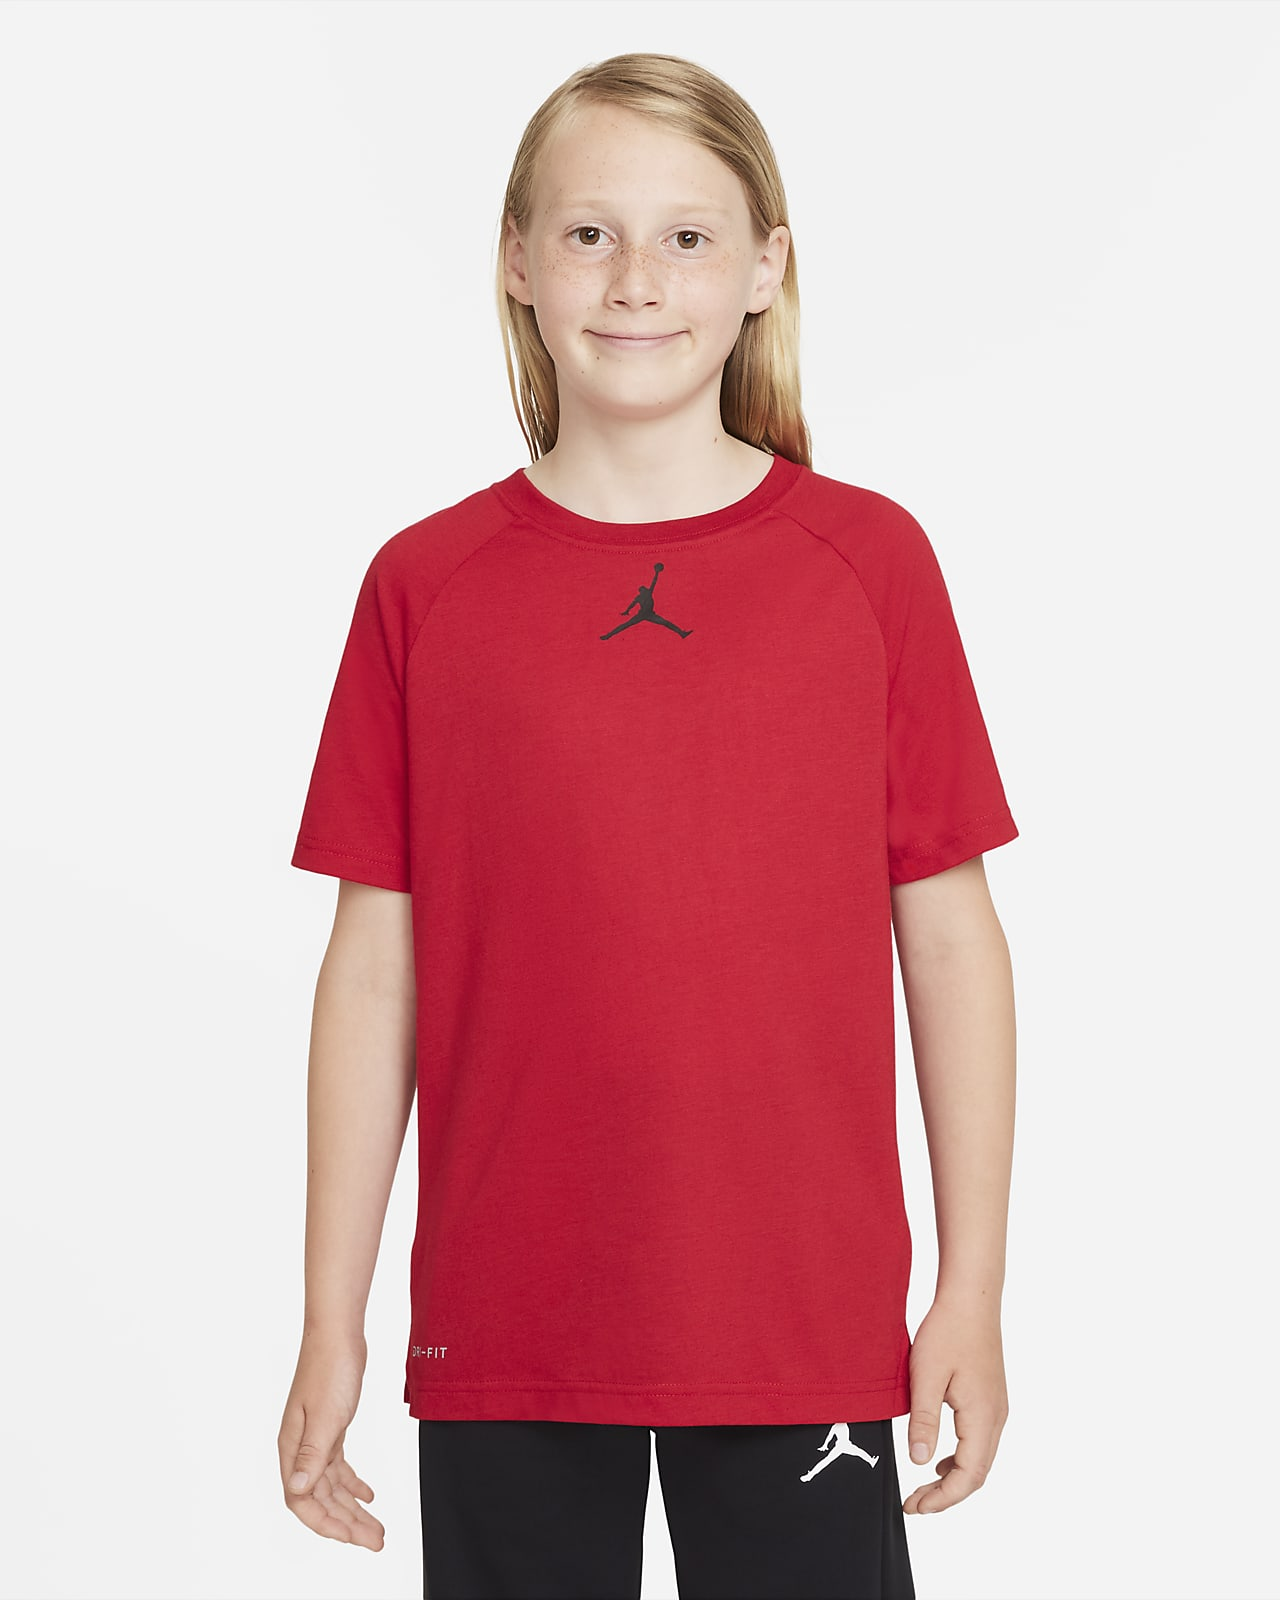 Prenda para la parte superior para niño talla grande Jordan Dri-FIT